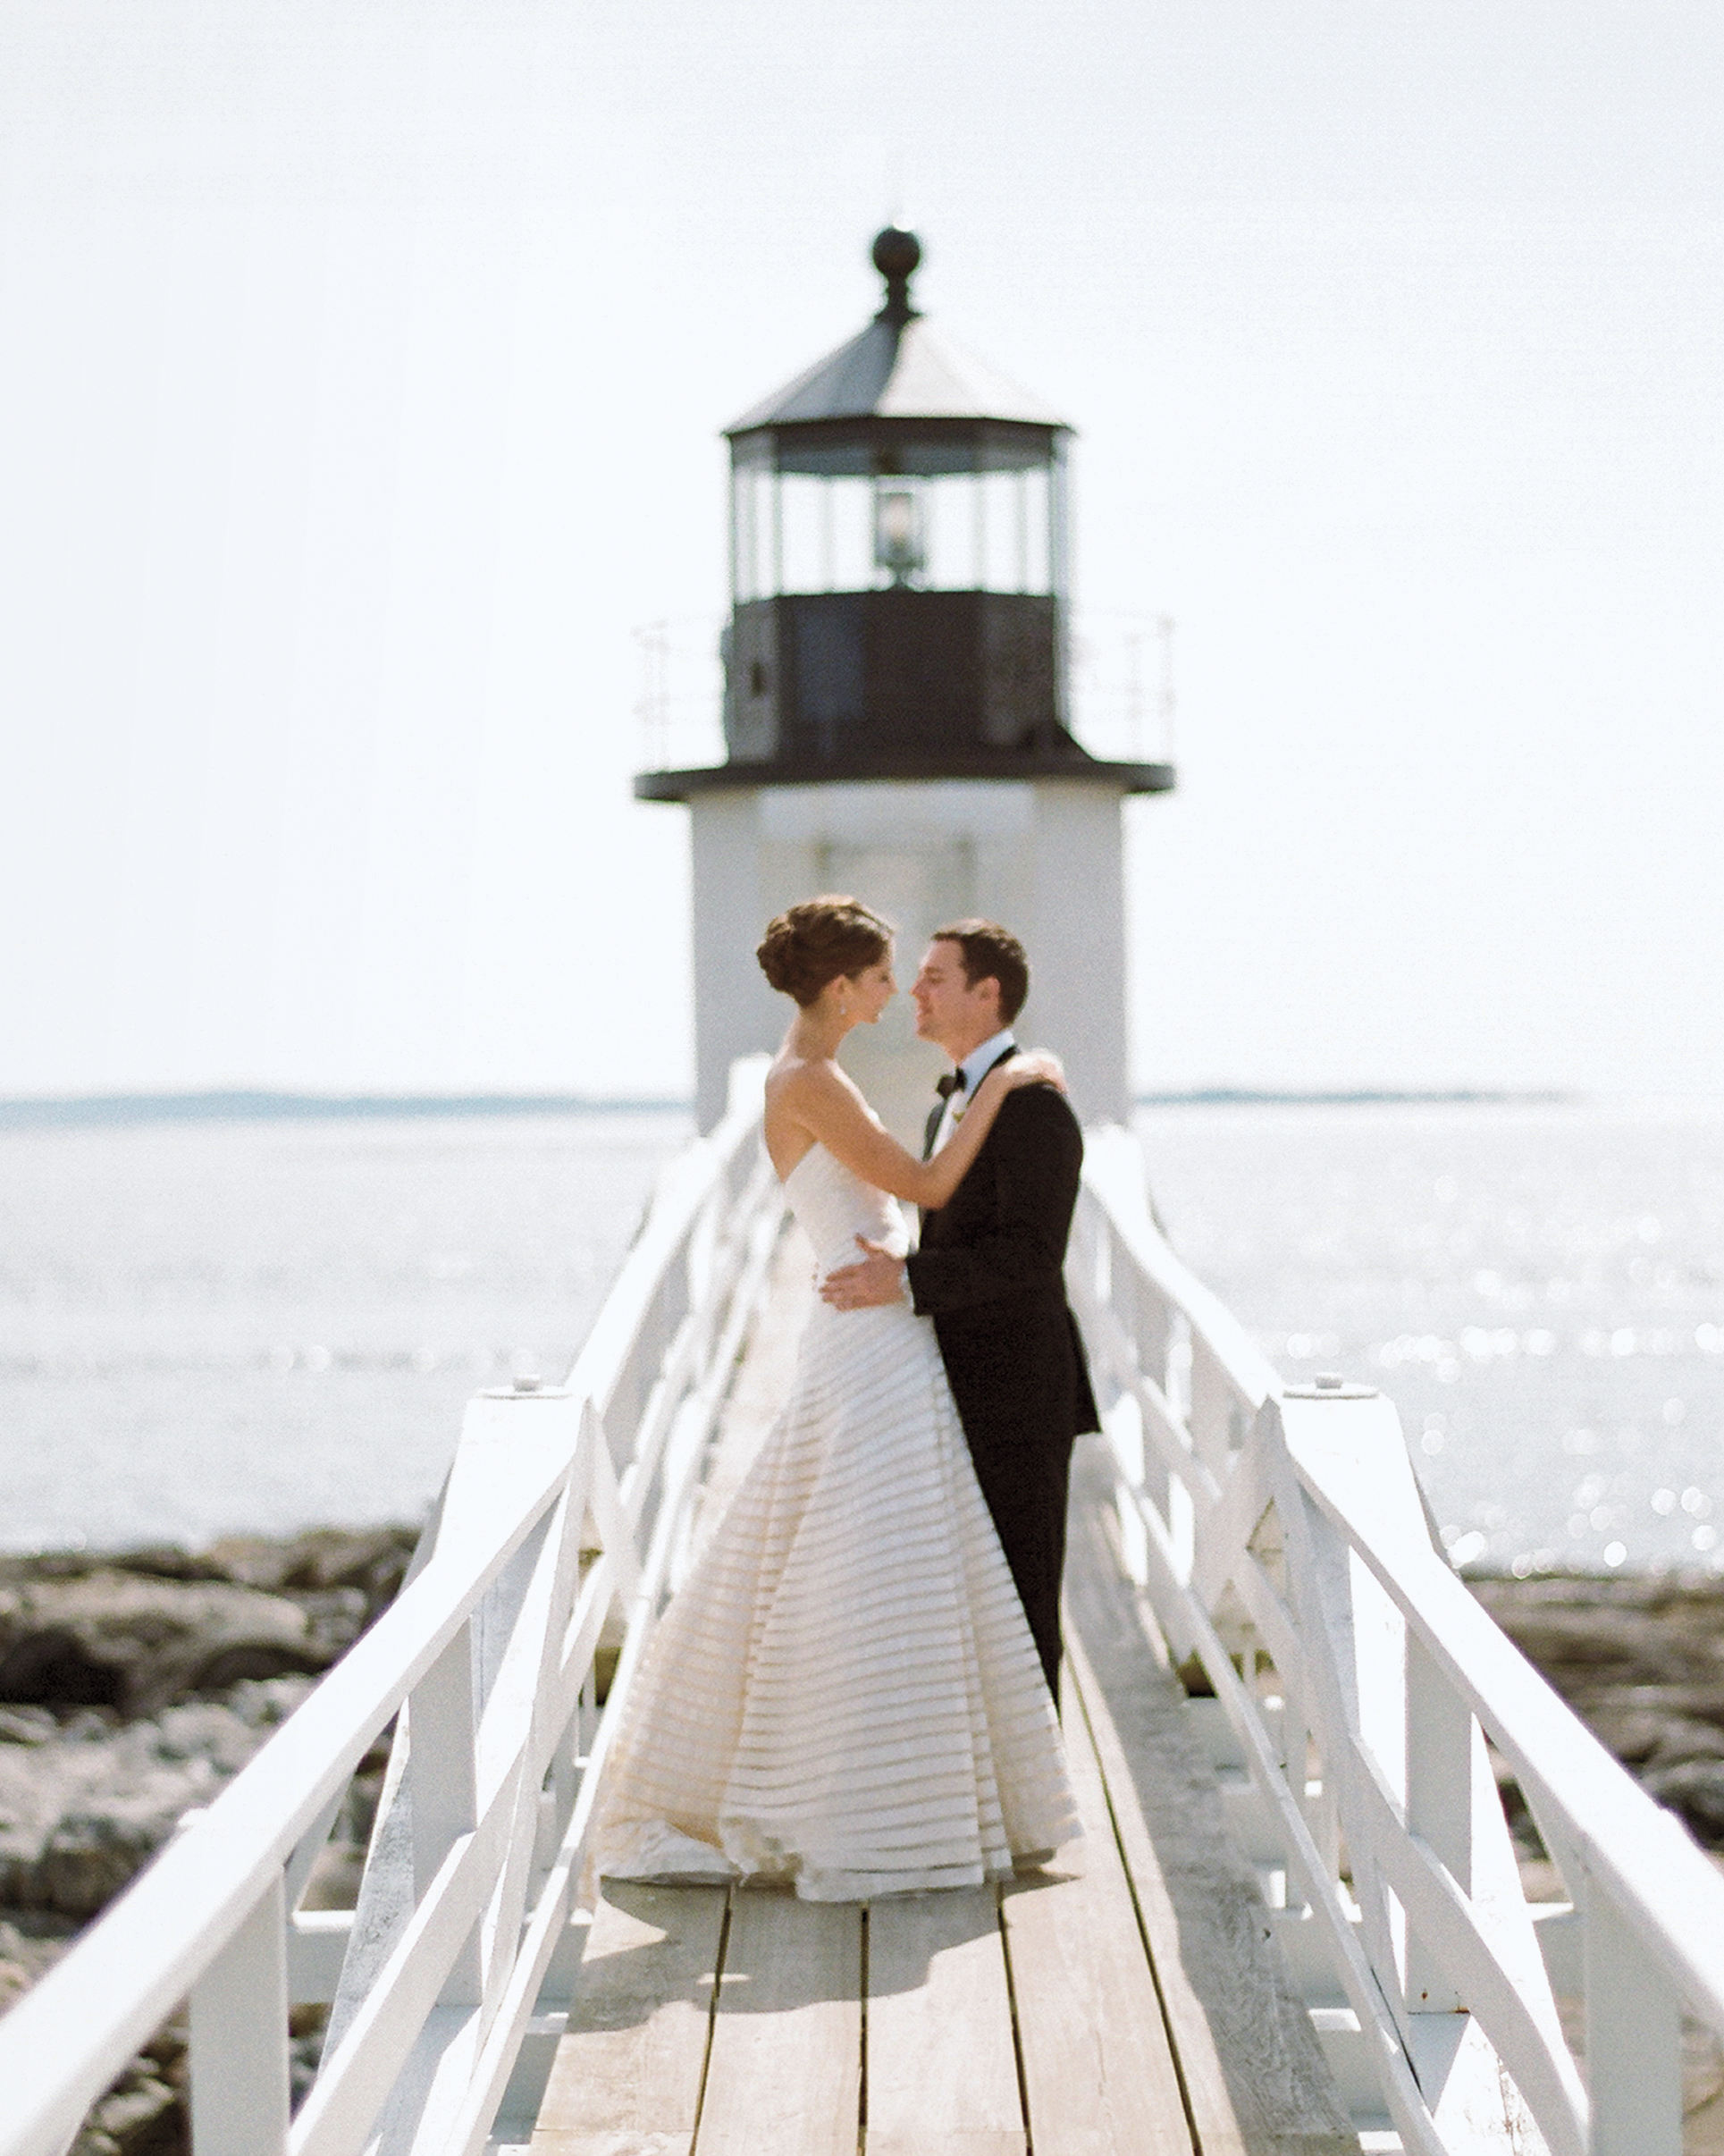 wedding-planning-079-edit-9780307954657-art-r1.jpg